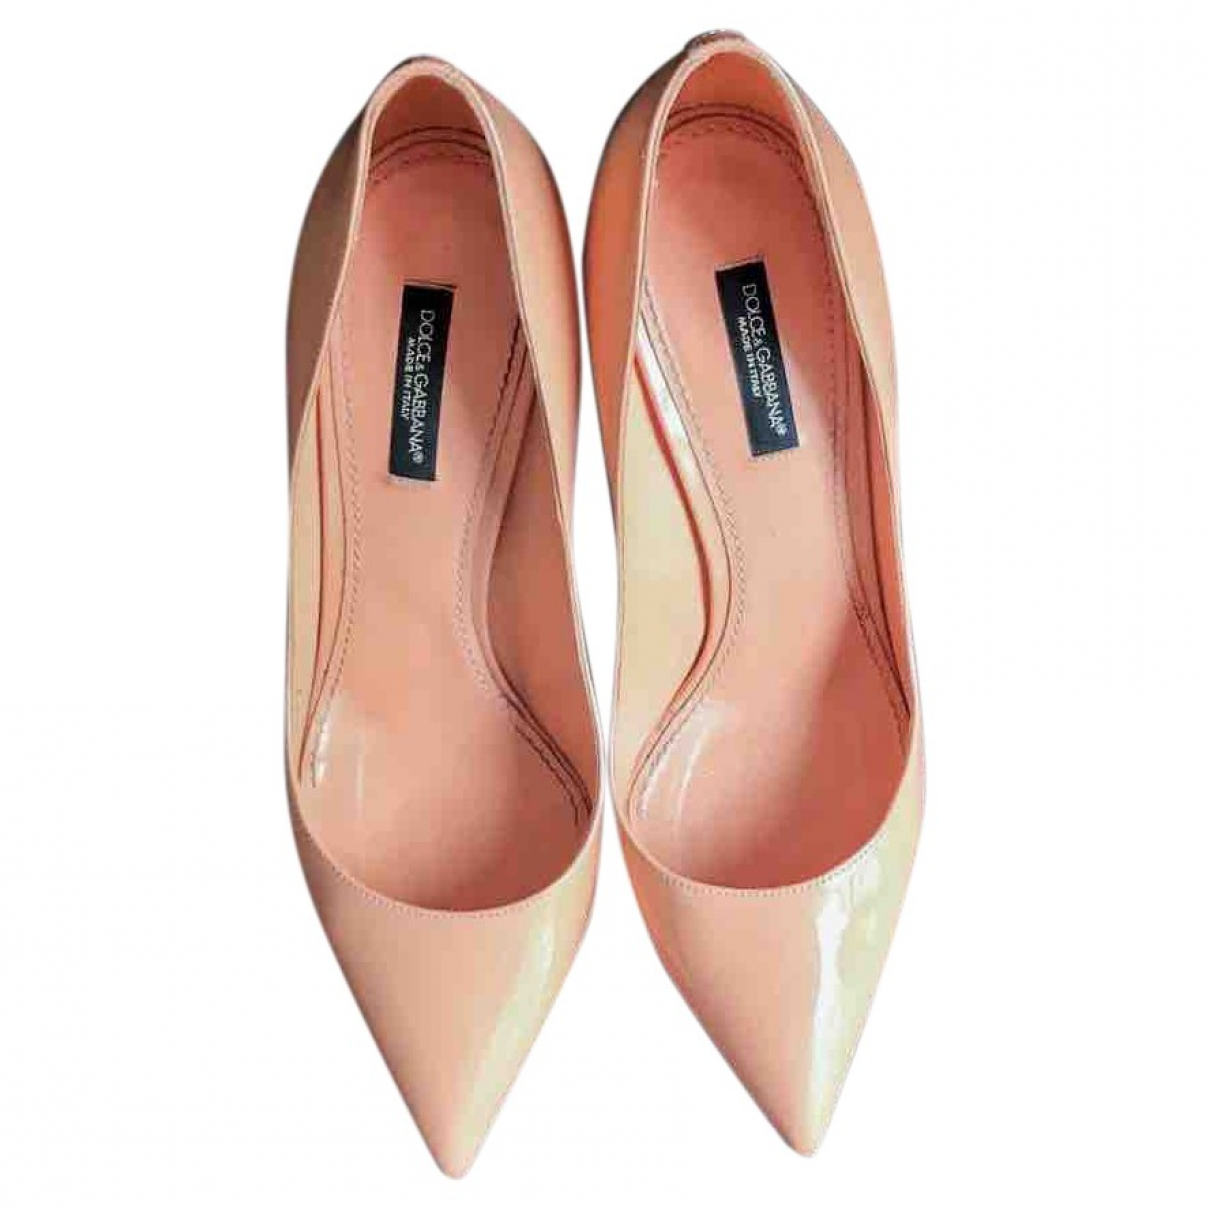 Dolce & Gabbana \N Pink Patent leather Heels for Women 37 EU